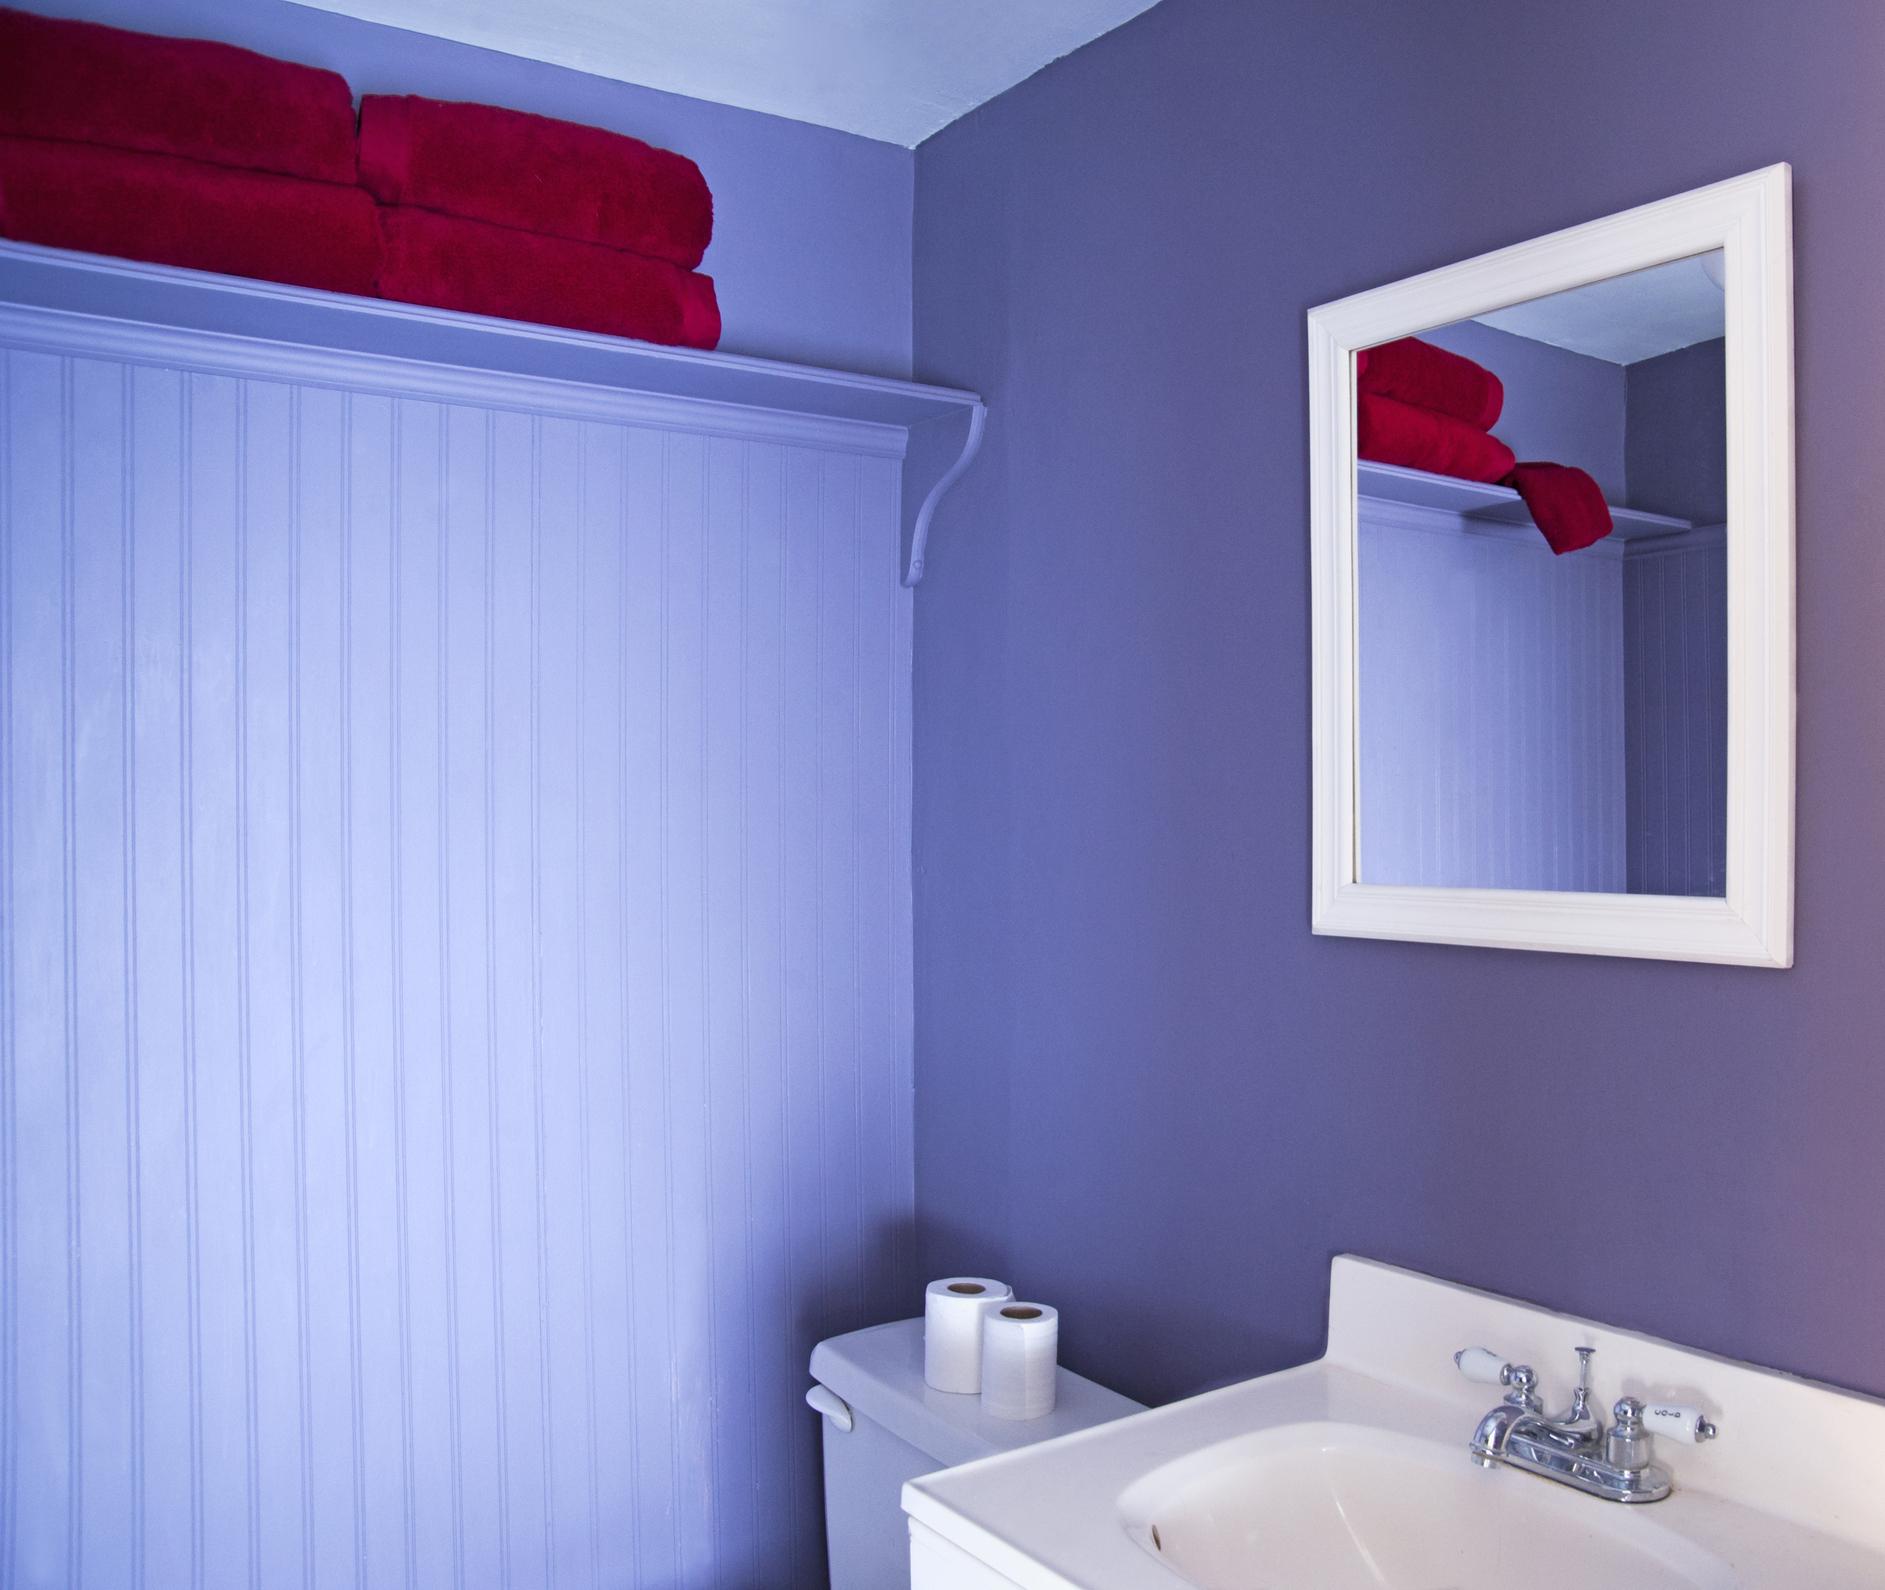 Mirror, sink and toilet in modern bathroom